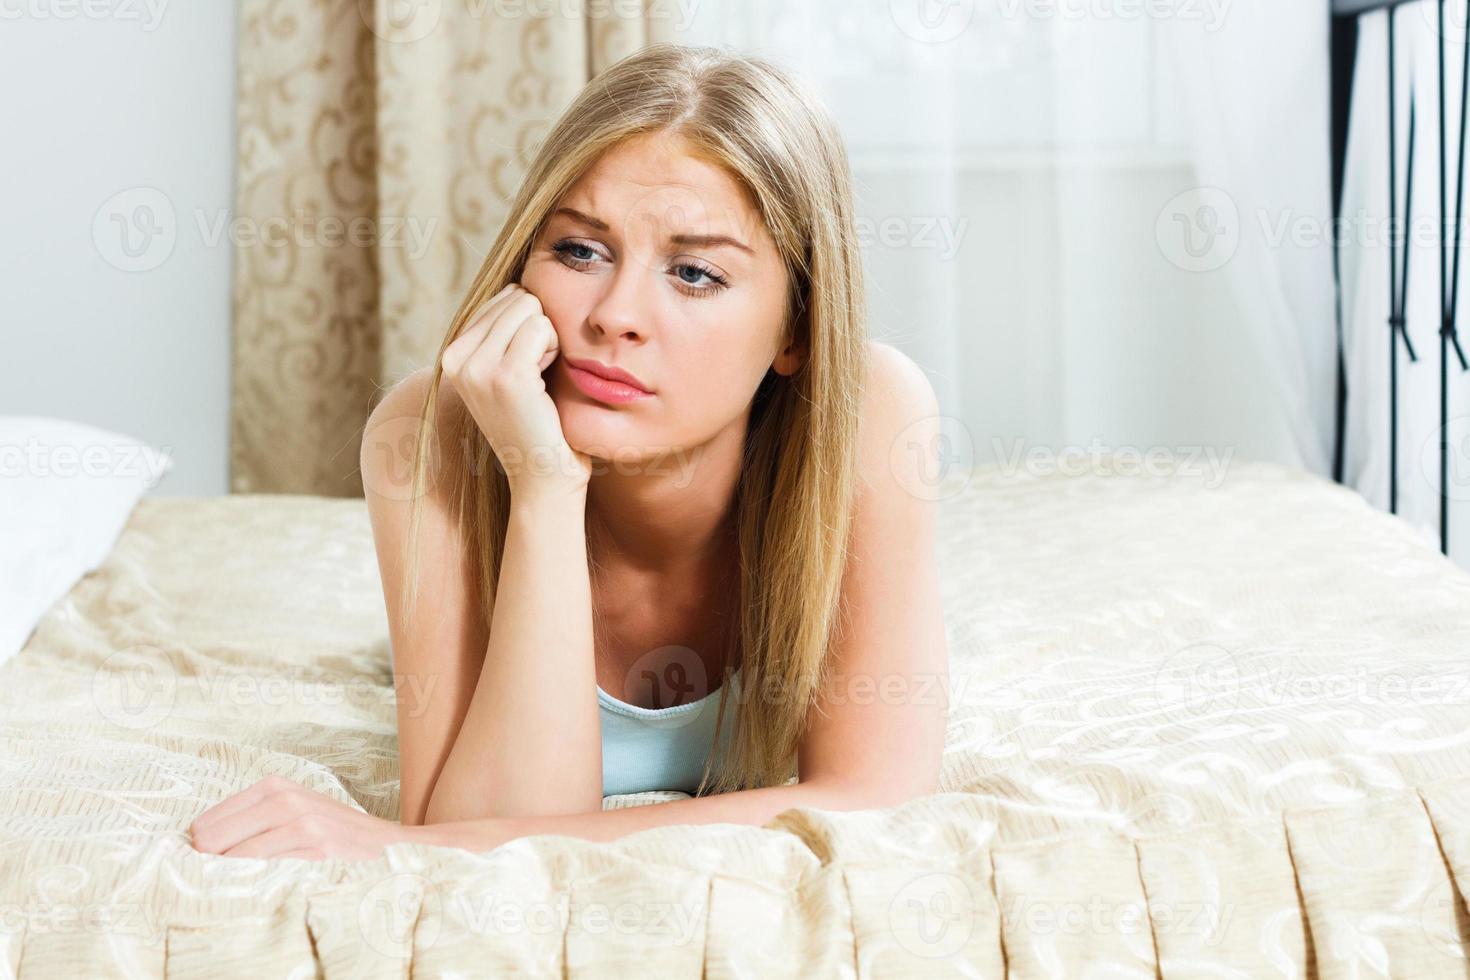 sorglig kvinna foto